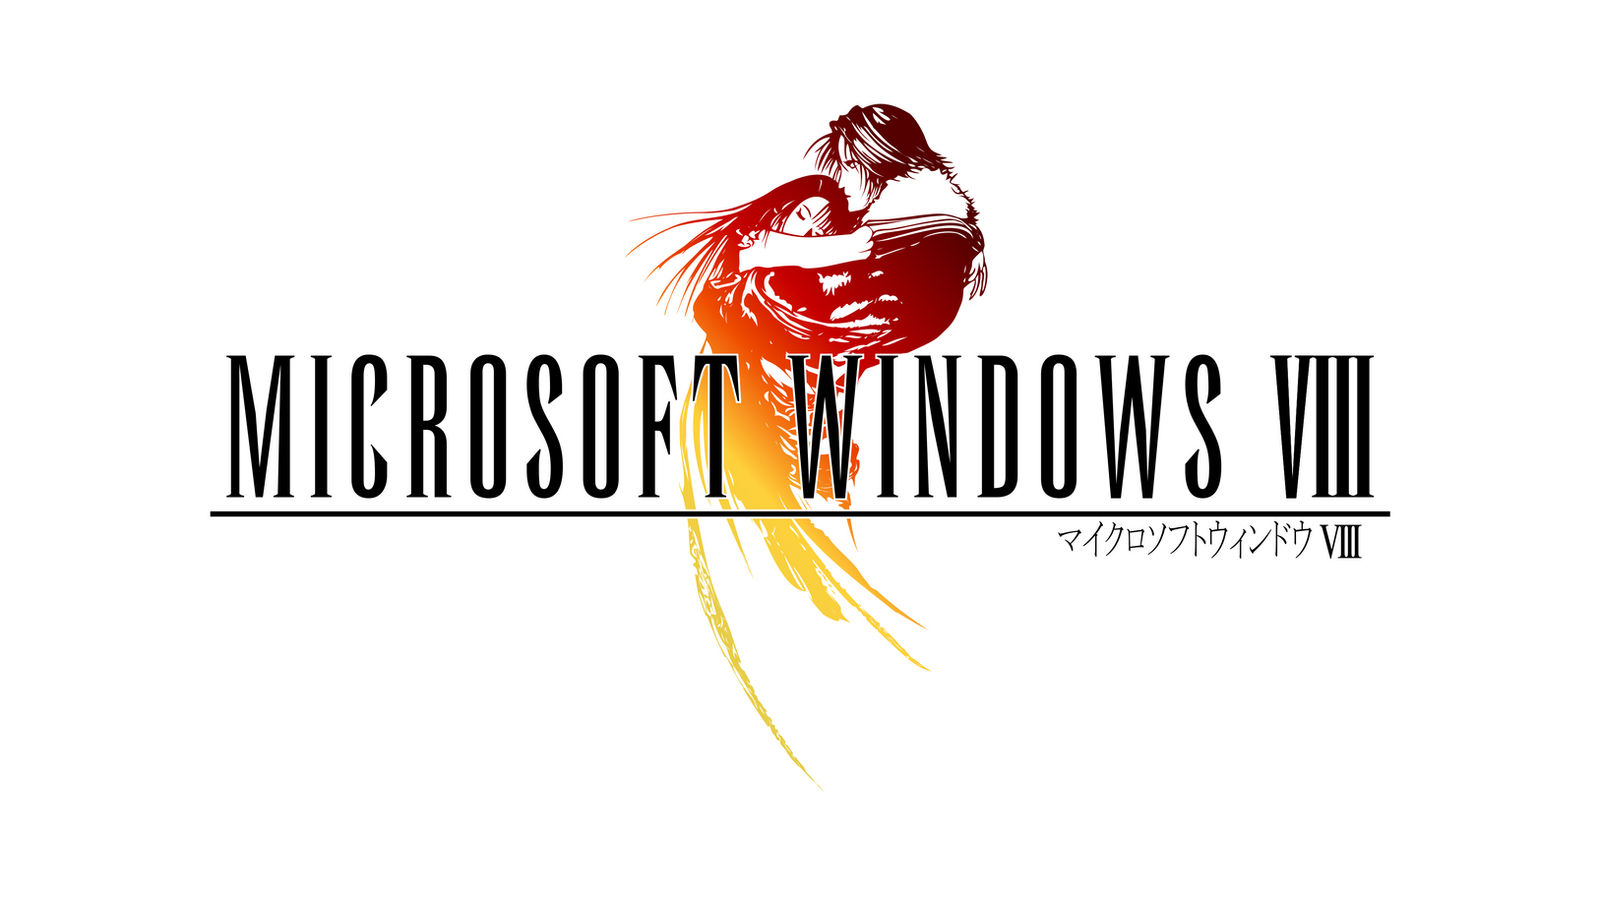 Final Fantasy VIII style Windows 8 Logo 2.0